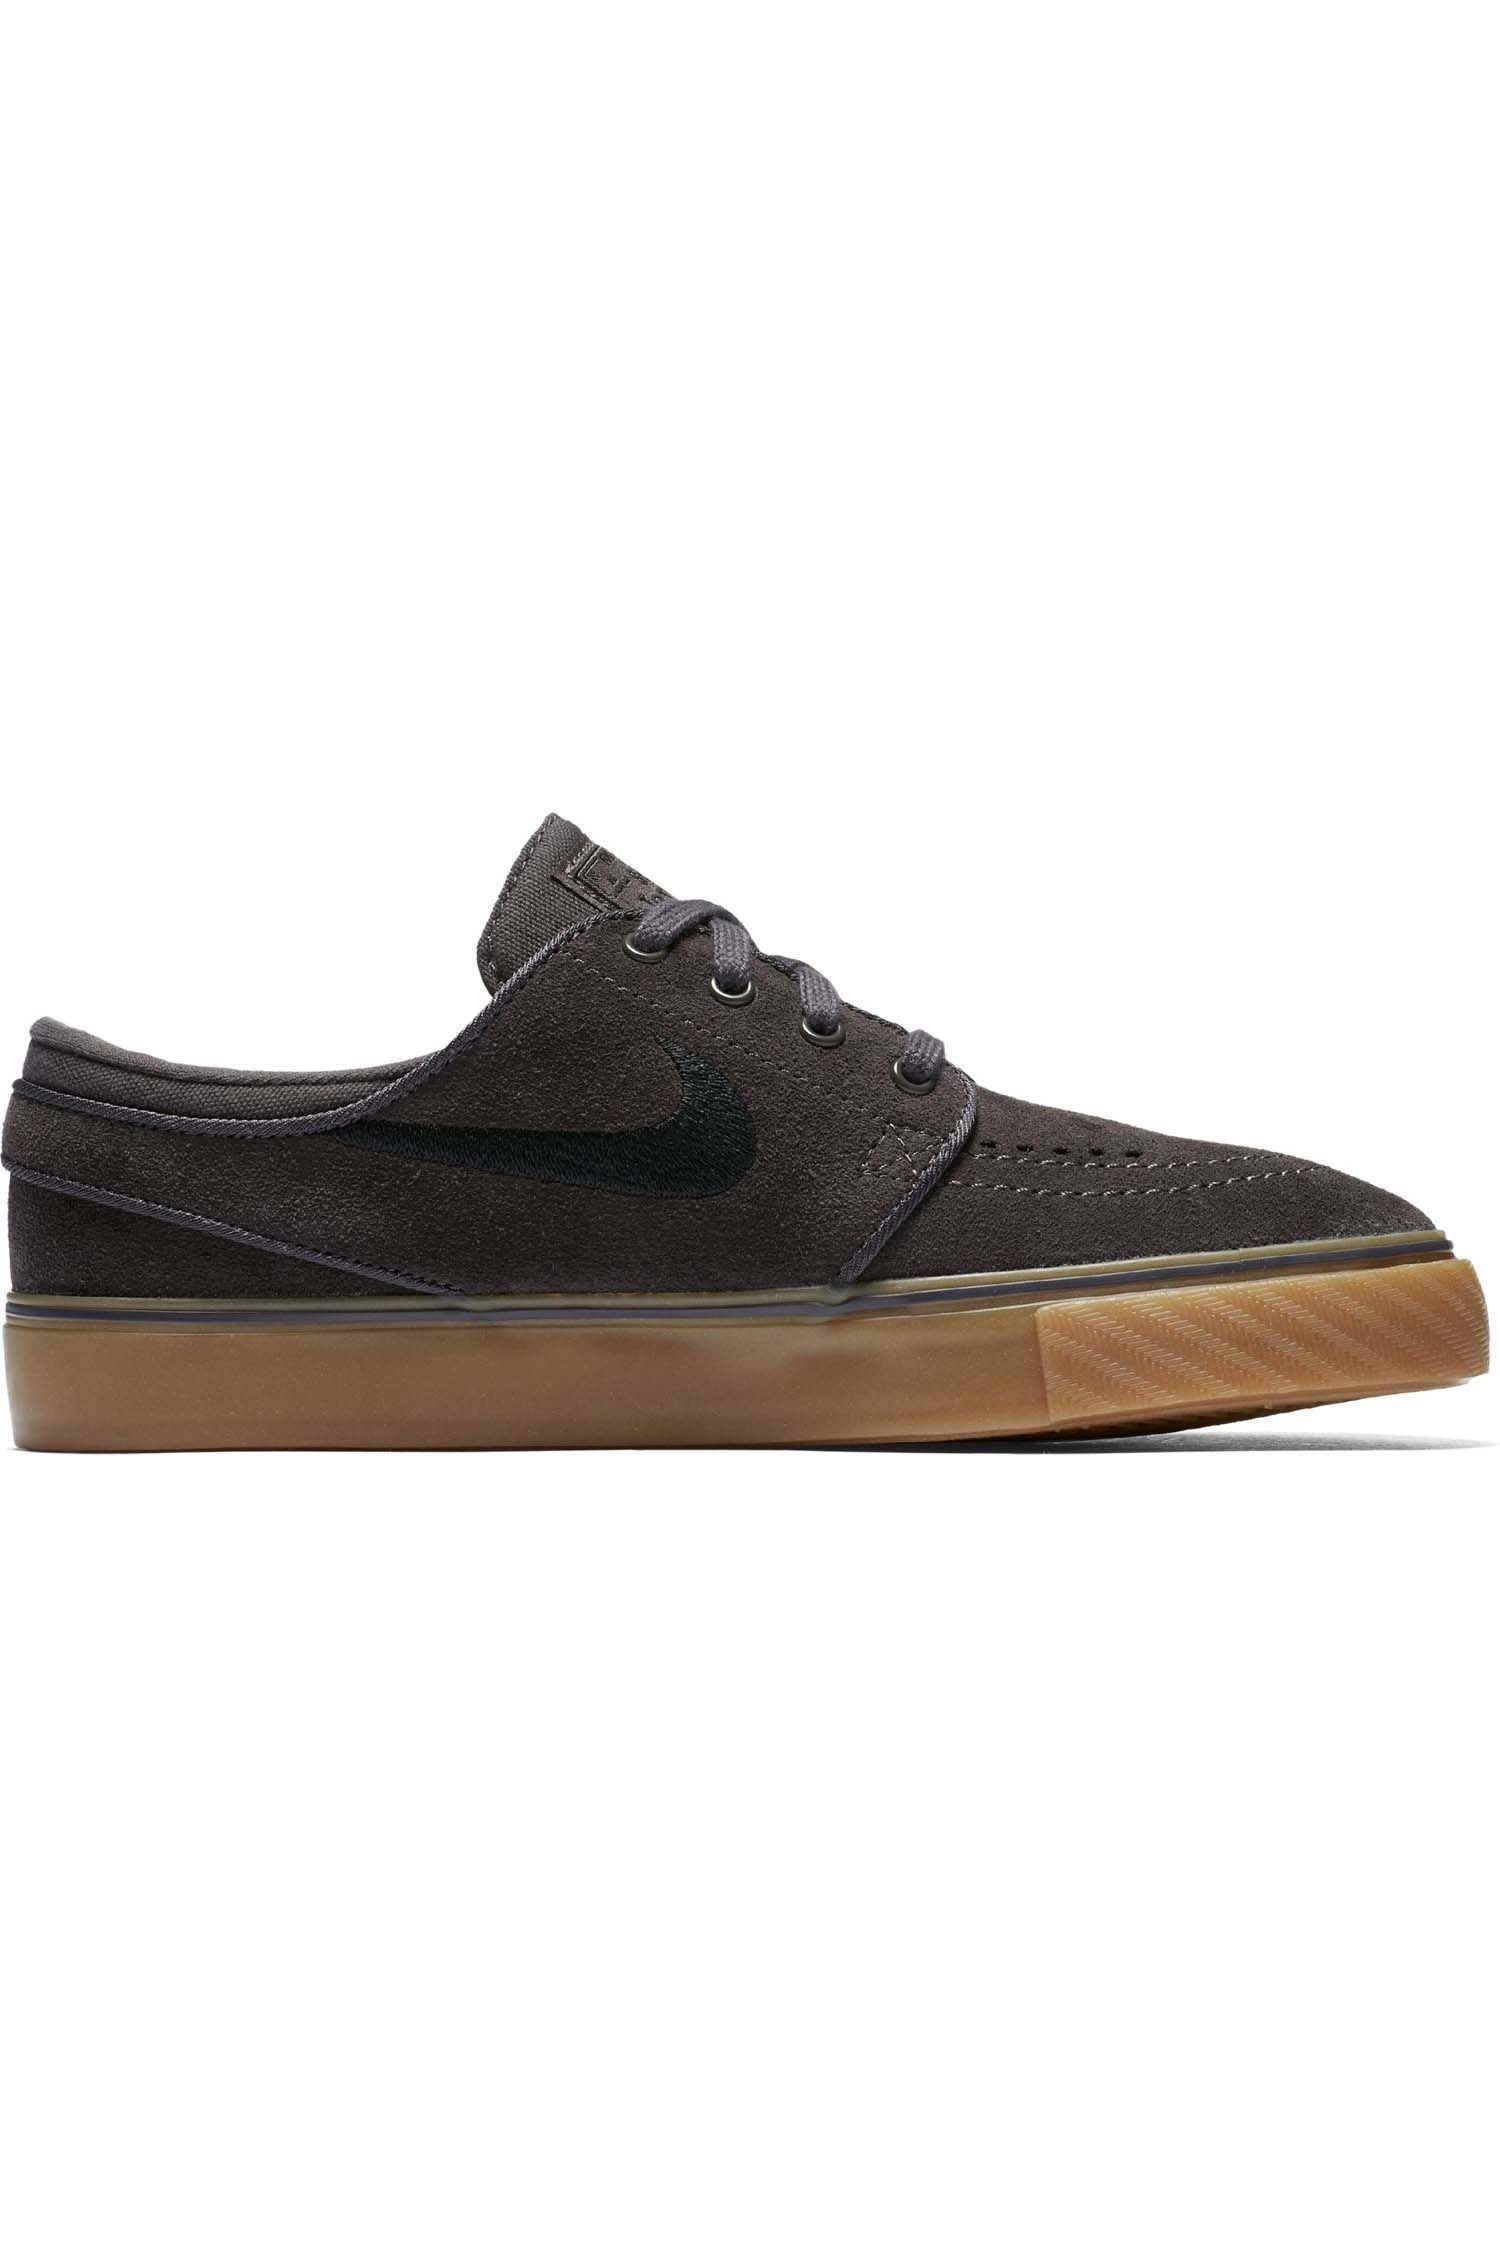 Tenis Nike Sb STEFAN JANOSKI (GS) Thunder Grey/Black-Gum Lt Brown